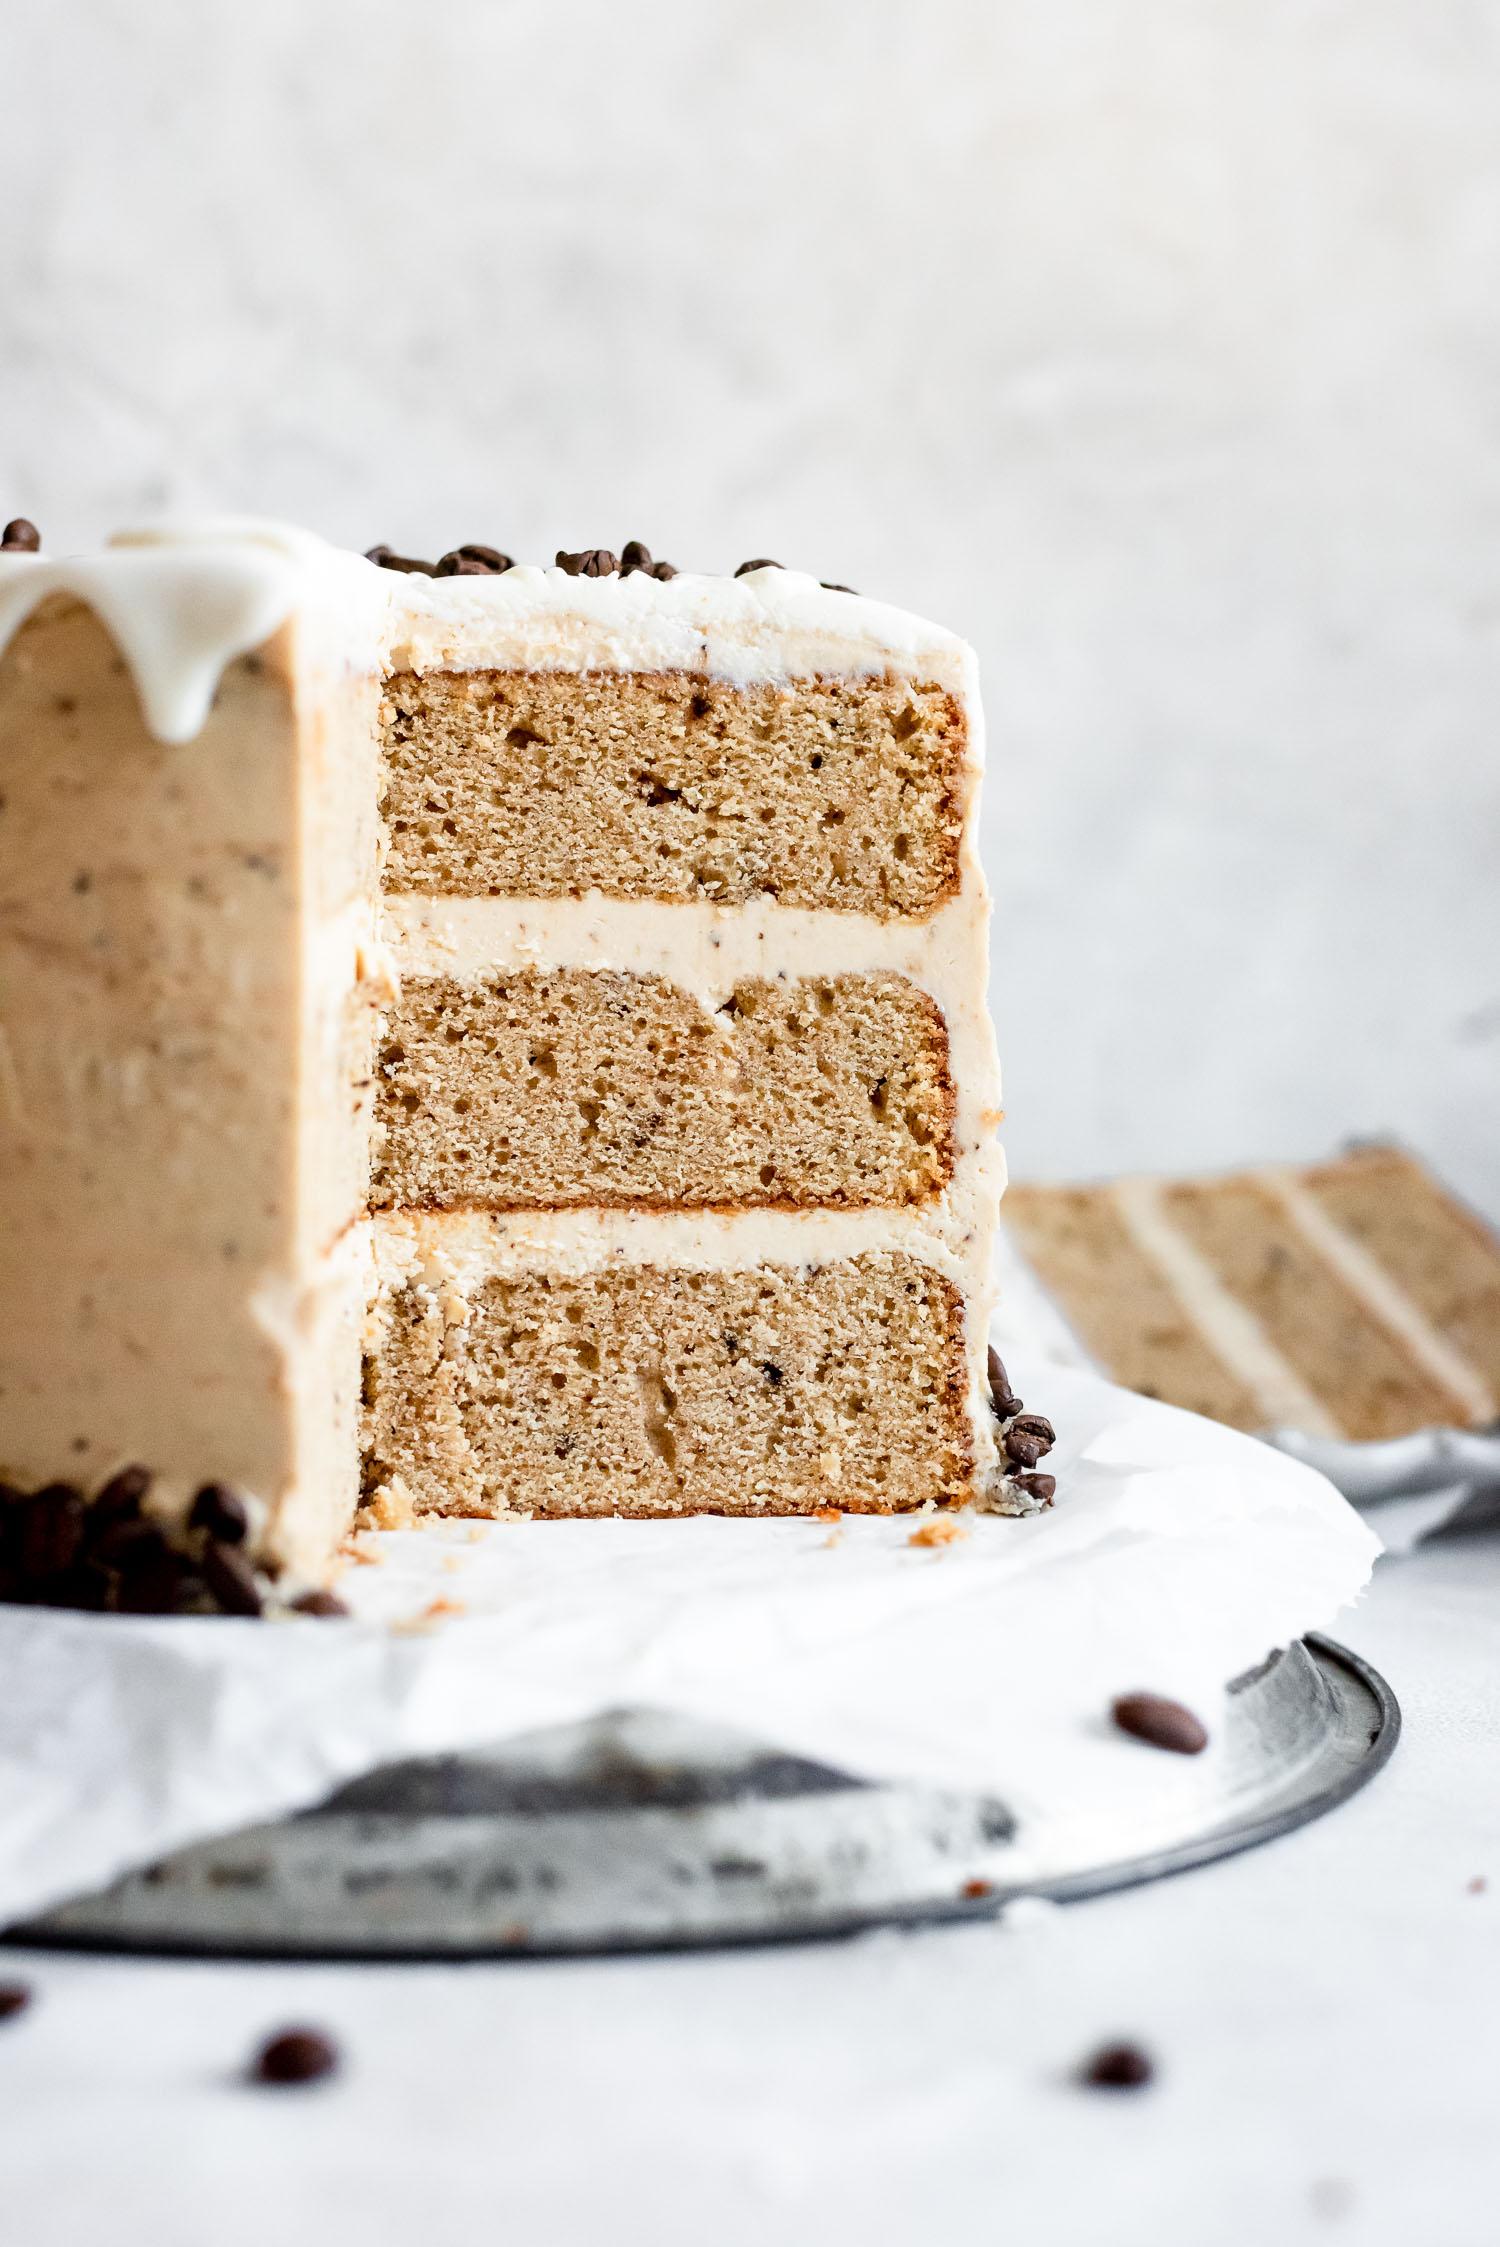 close up showing inside of cake after slicing